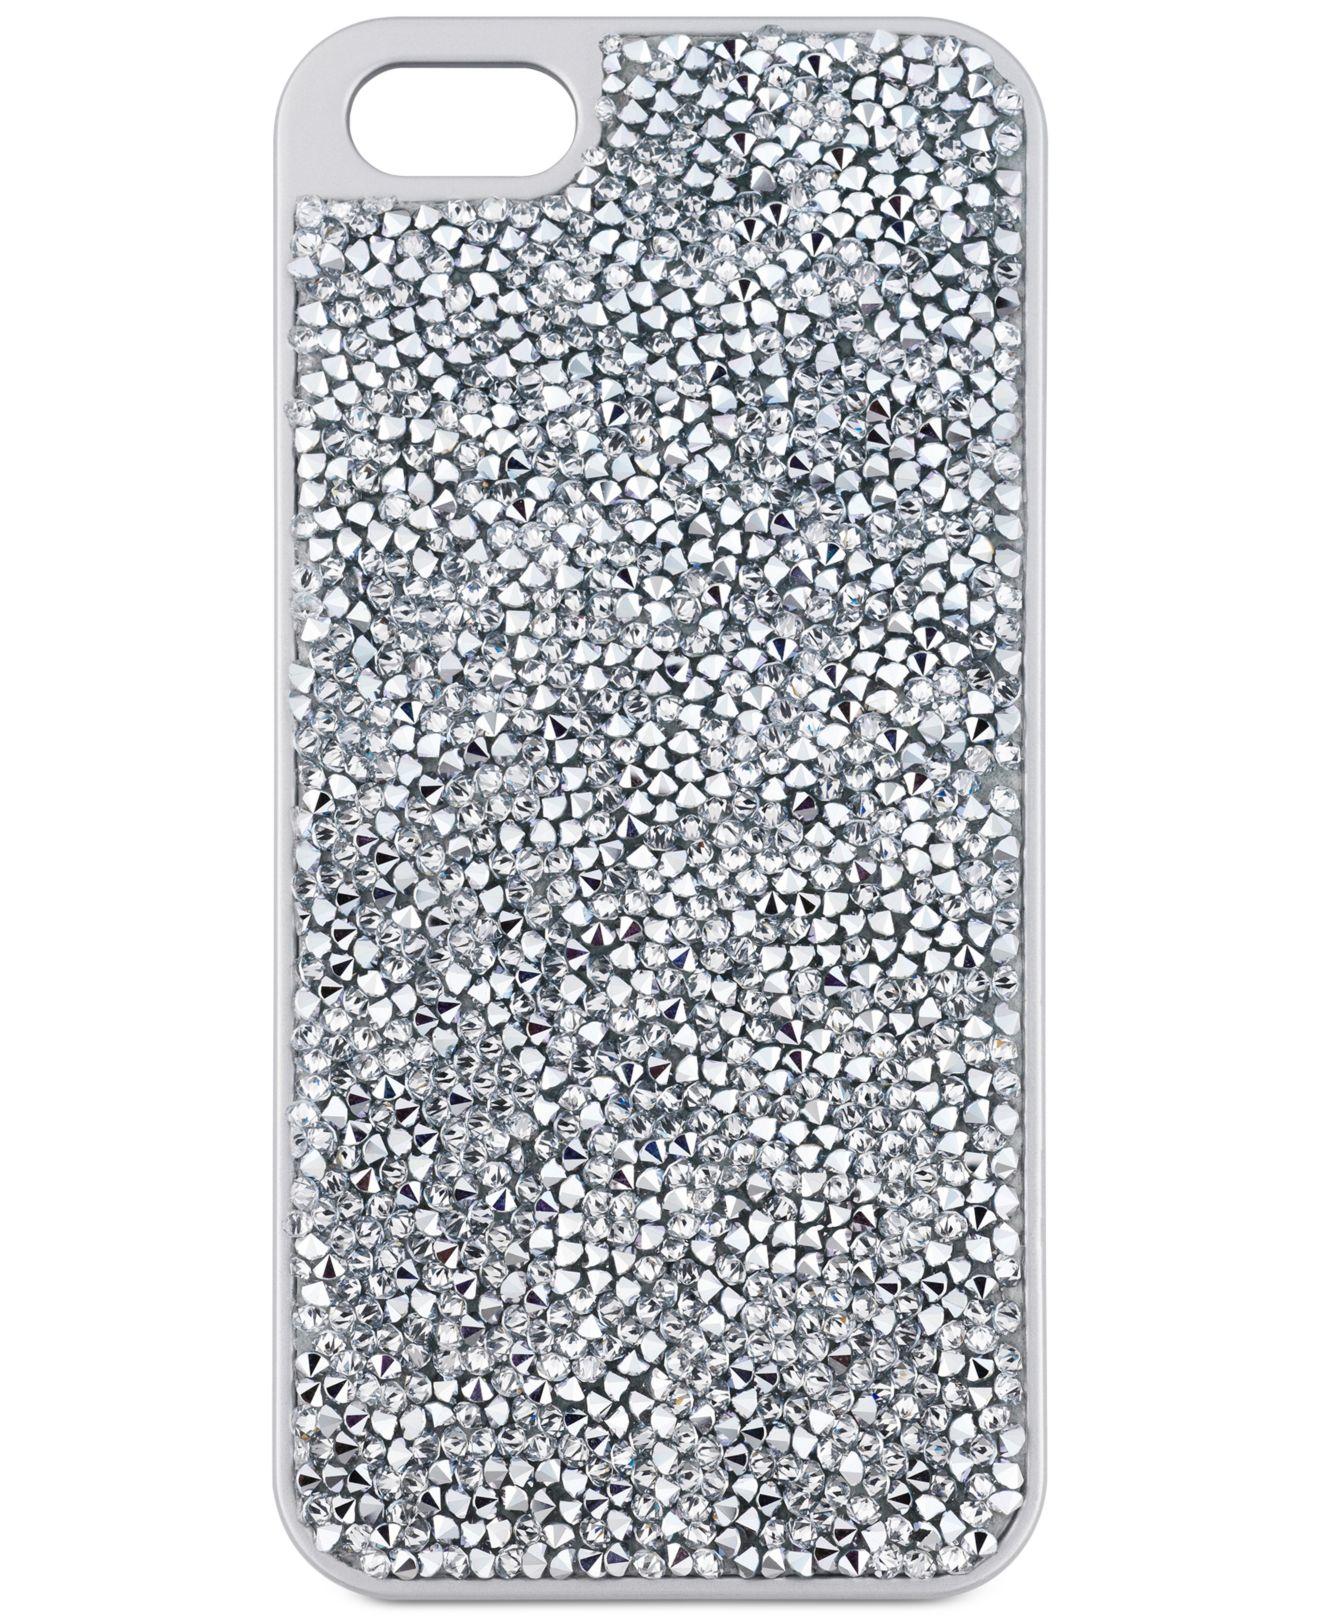 Lyst - Swarovski Silver-tone Glam Rock Iphone 6 Case in Metallic 50592c0f9c